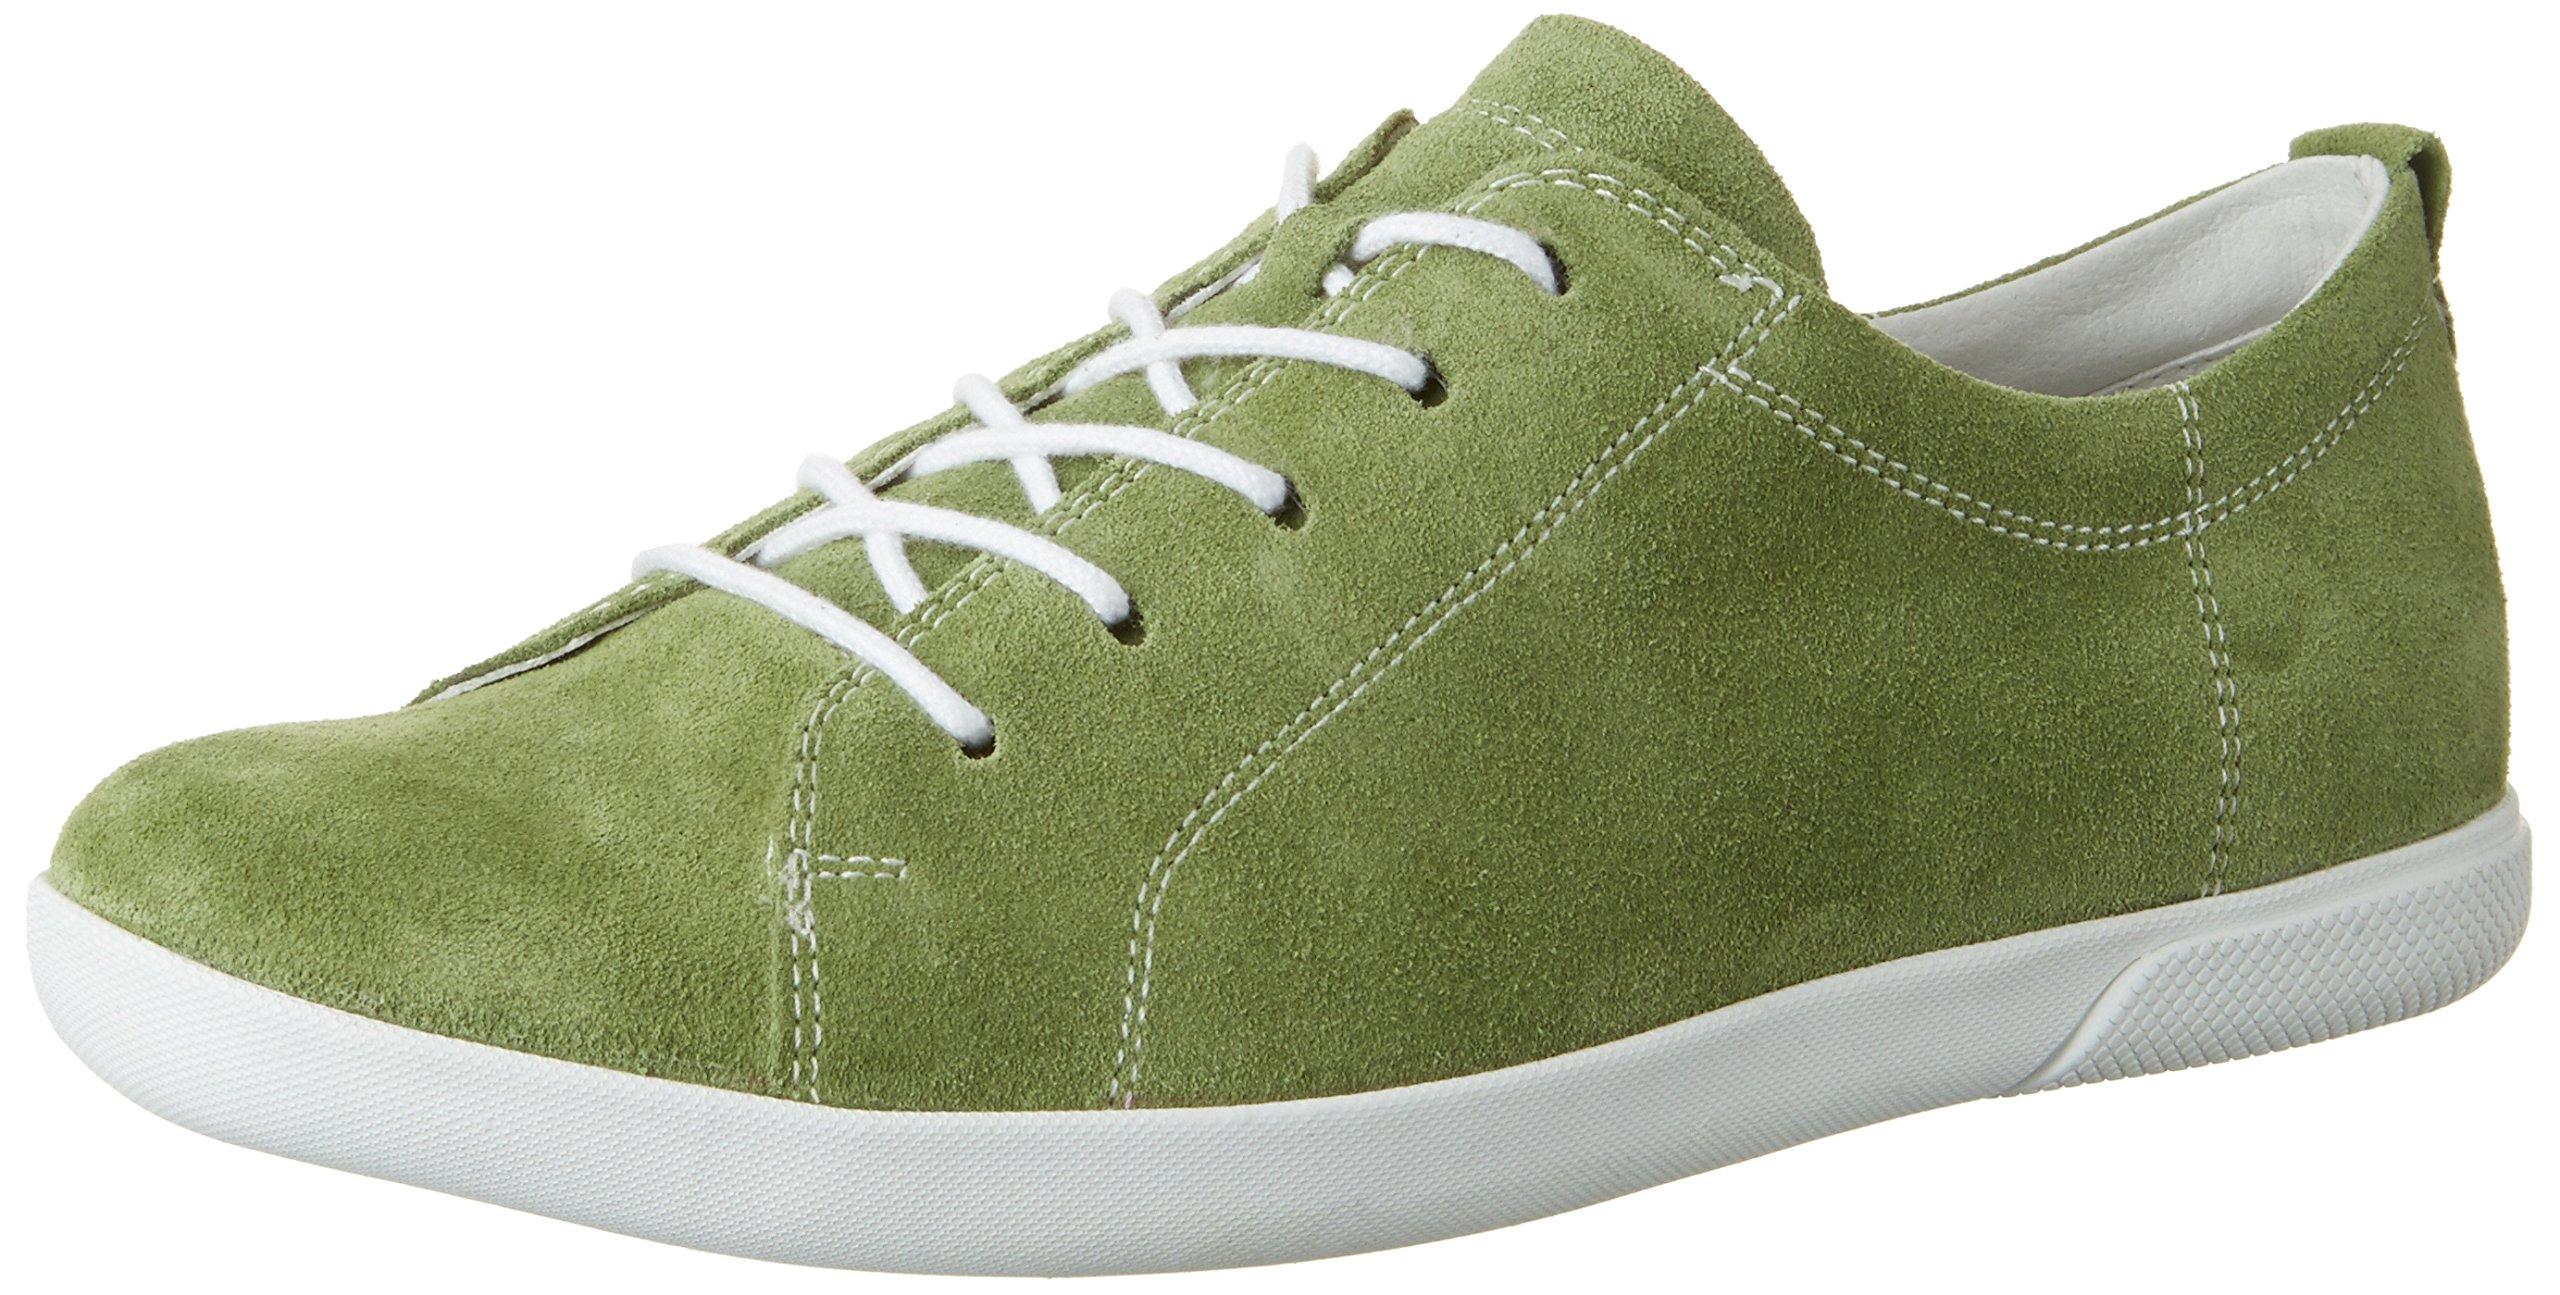 Seibel 15Sneakers FemmeVert Josef Vert43 Ciara Basses yY7vfb6g